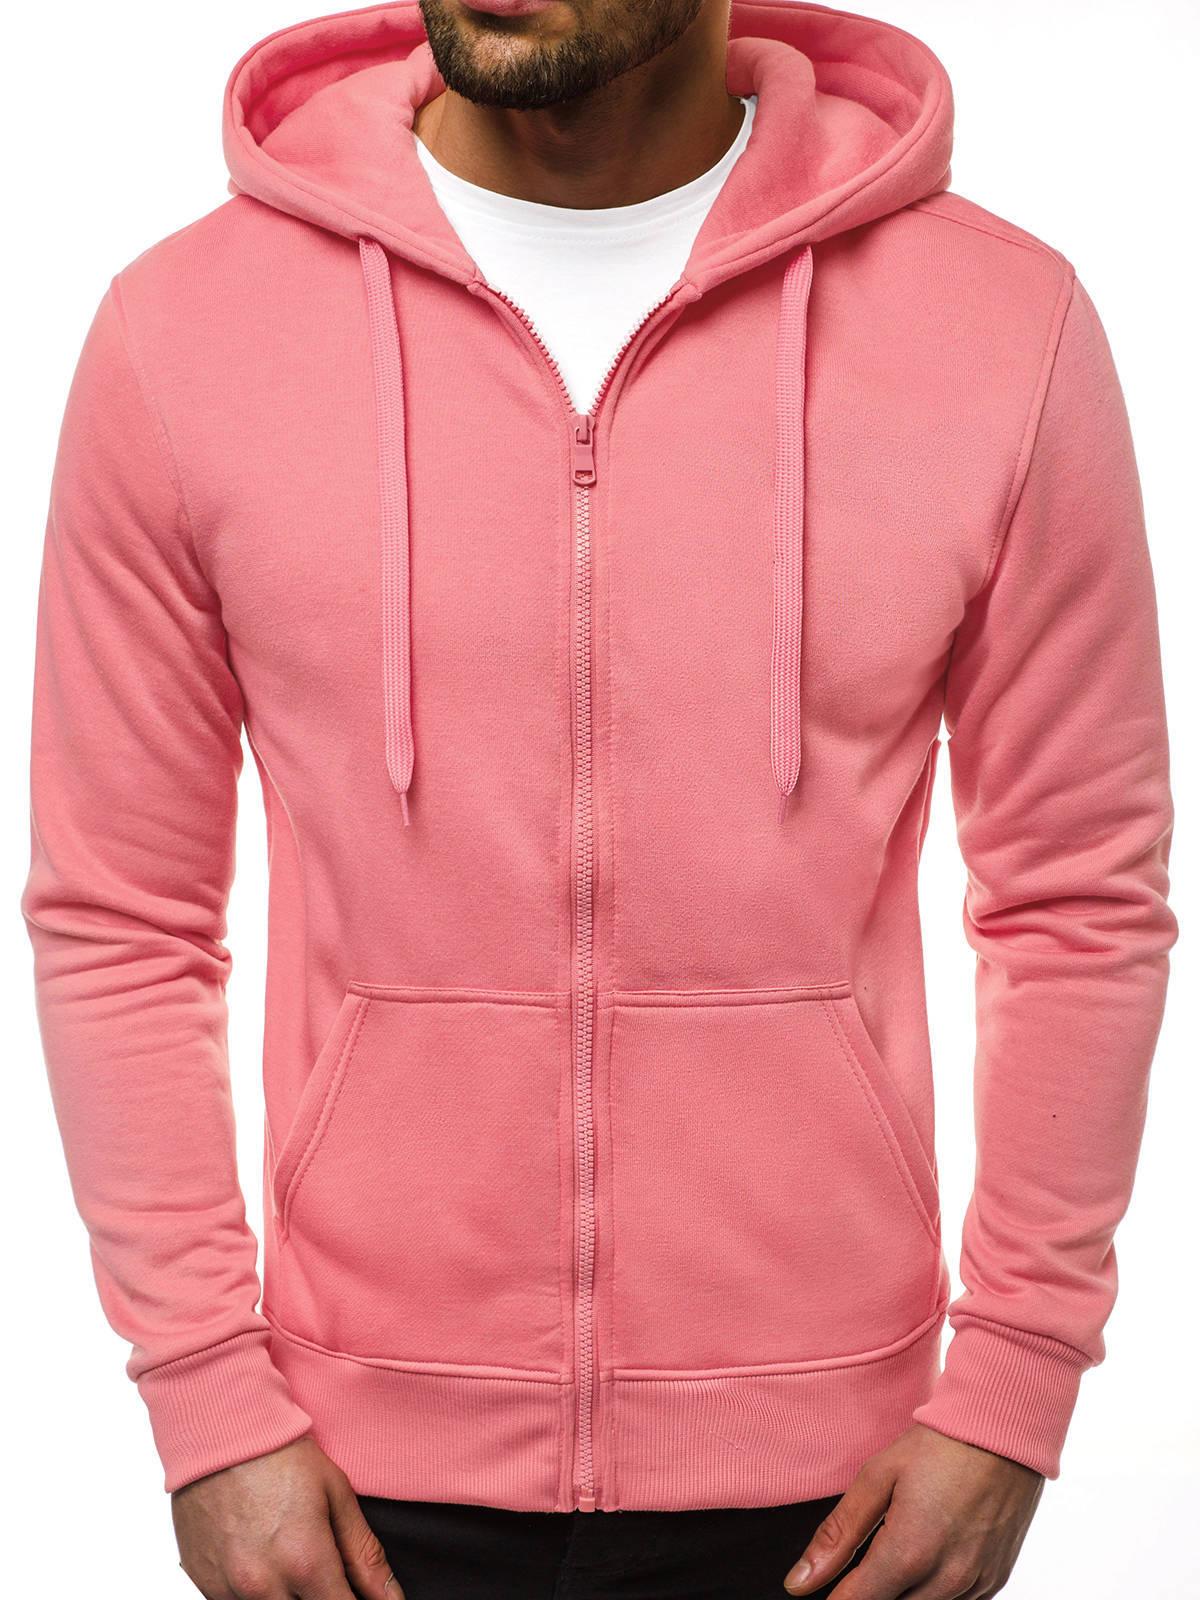 Indexbild 49 - Kapuzenpullover Sweatjacke Hoodie Sweatshirt Pullover Basic Herren OZONEE 46 7M7